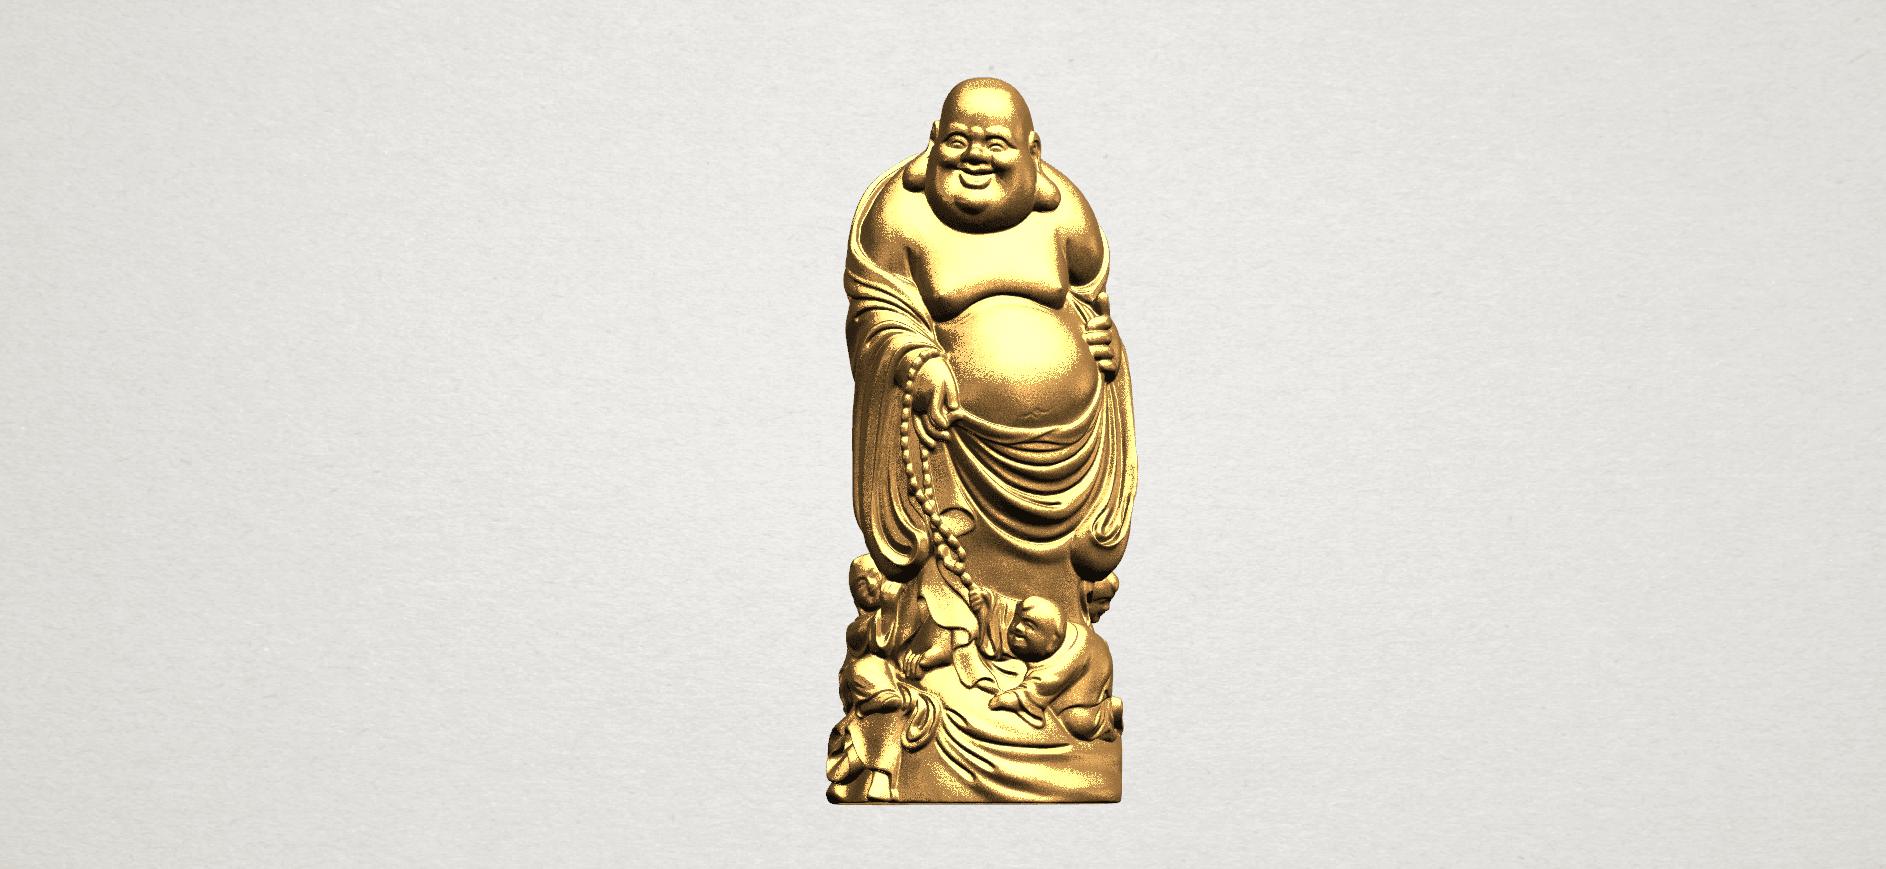 TDA0070 Metteyya Buddha 03 - 88mm - A01.png Download free STL file Metteyya Buddha 03 • 3D printing object, GeorgesNikkei